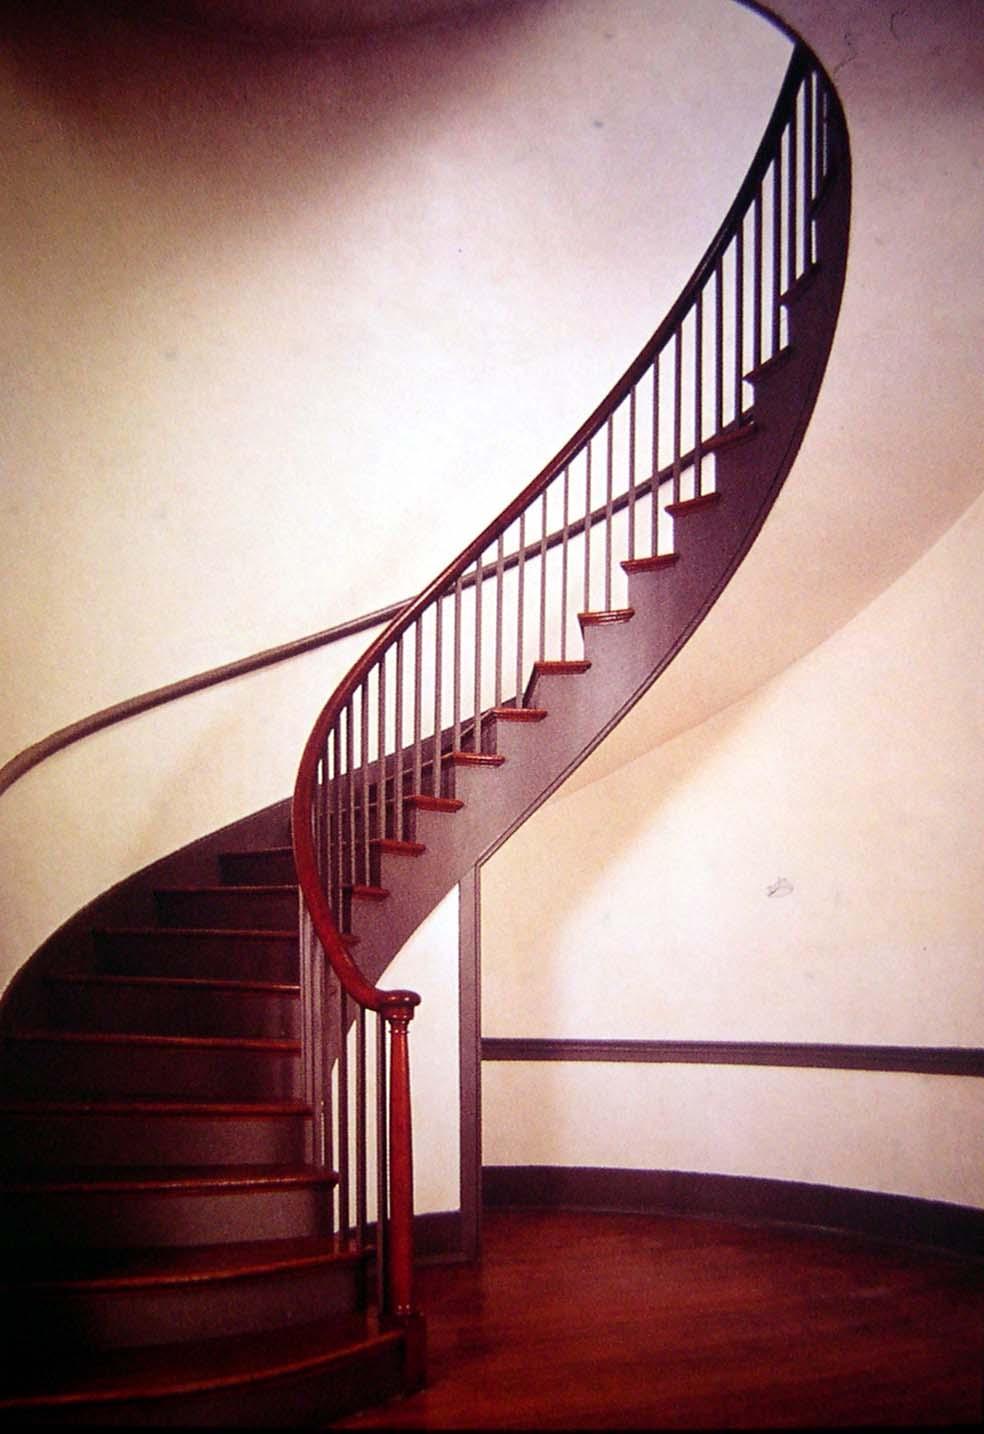 Peque as lecciones de dise o 92 ocho escaleras - Disenos de escaleras para casas pequenas ...